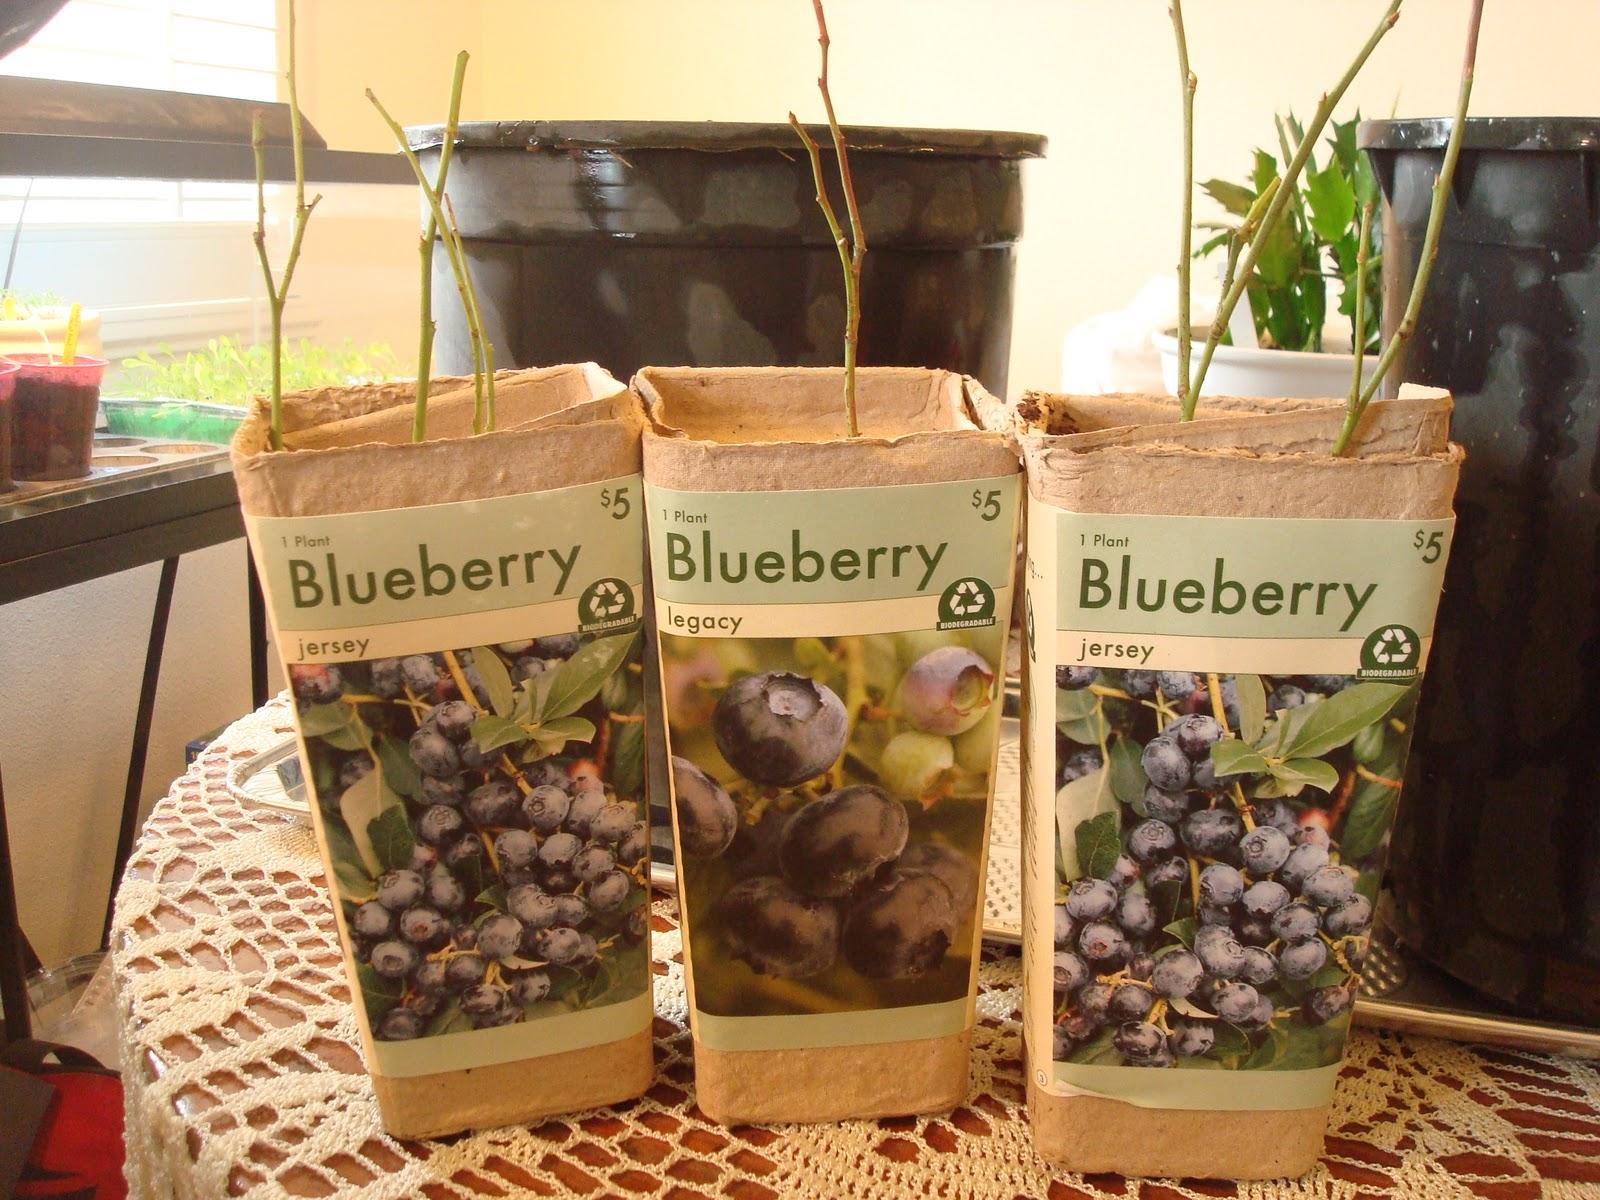 Northern Nevada Jr. Gardener: I\'m planting Blueberry bushes this ...